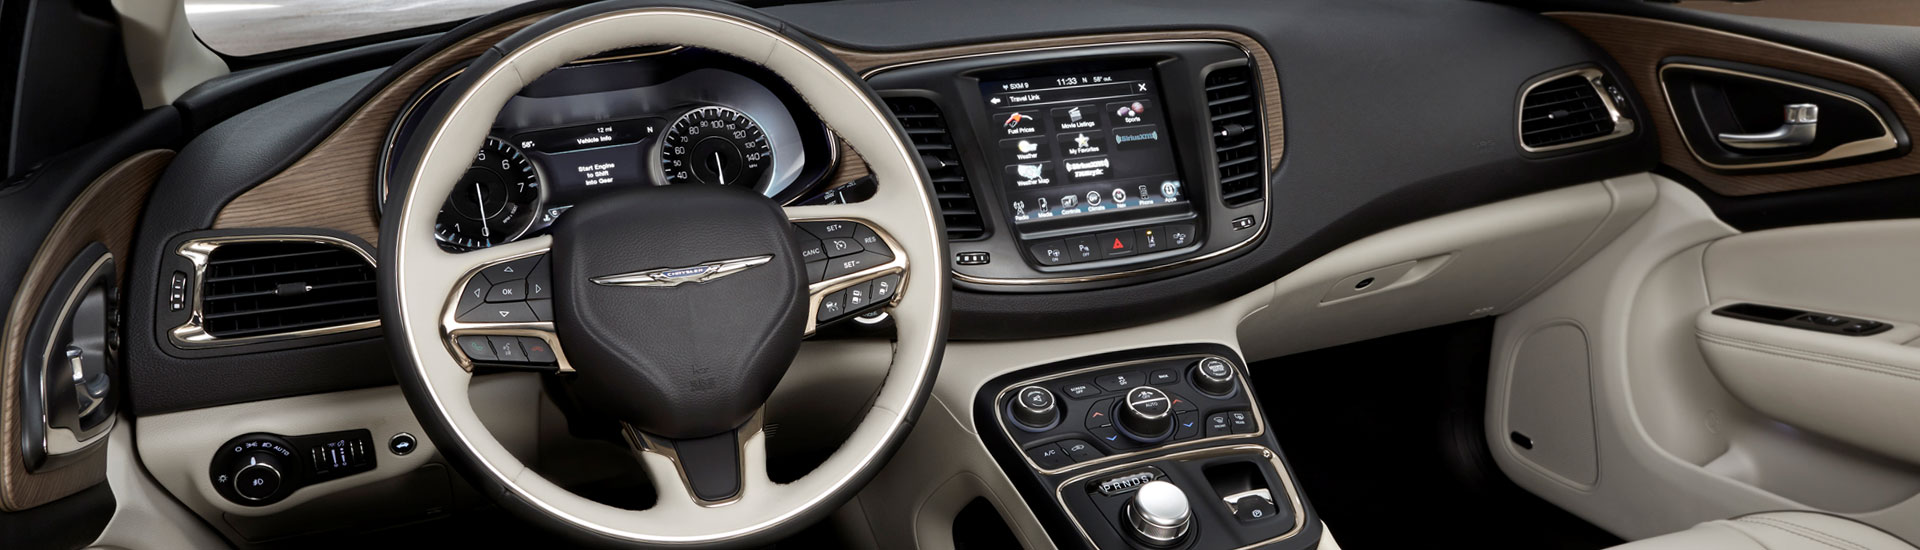 Chrysler 200 dash kits custom chrysler 200 dash kit chrysler 200 custom dash kits publicscrutiny Image collections